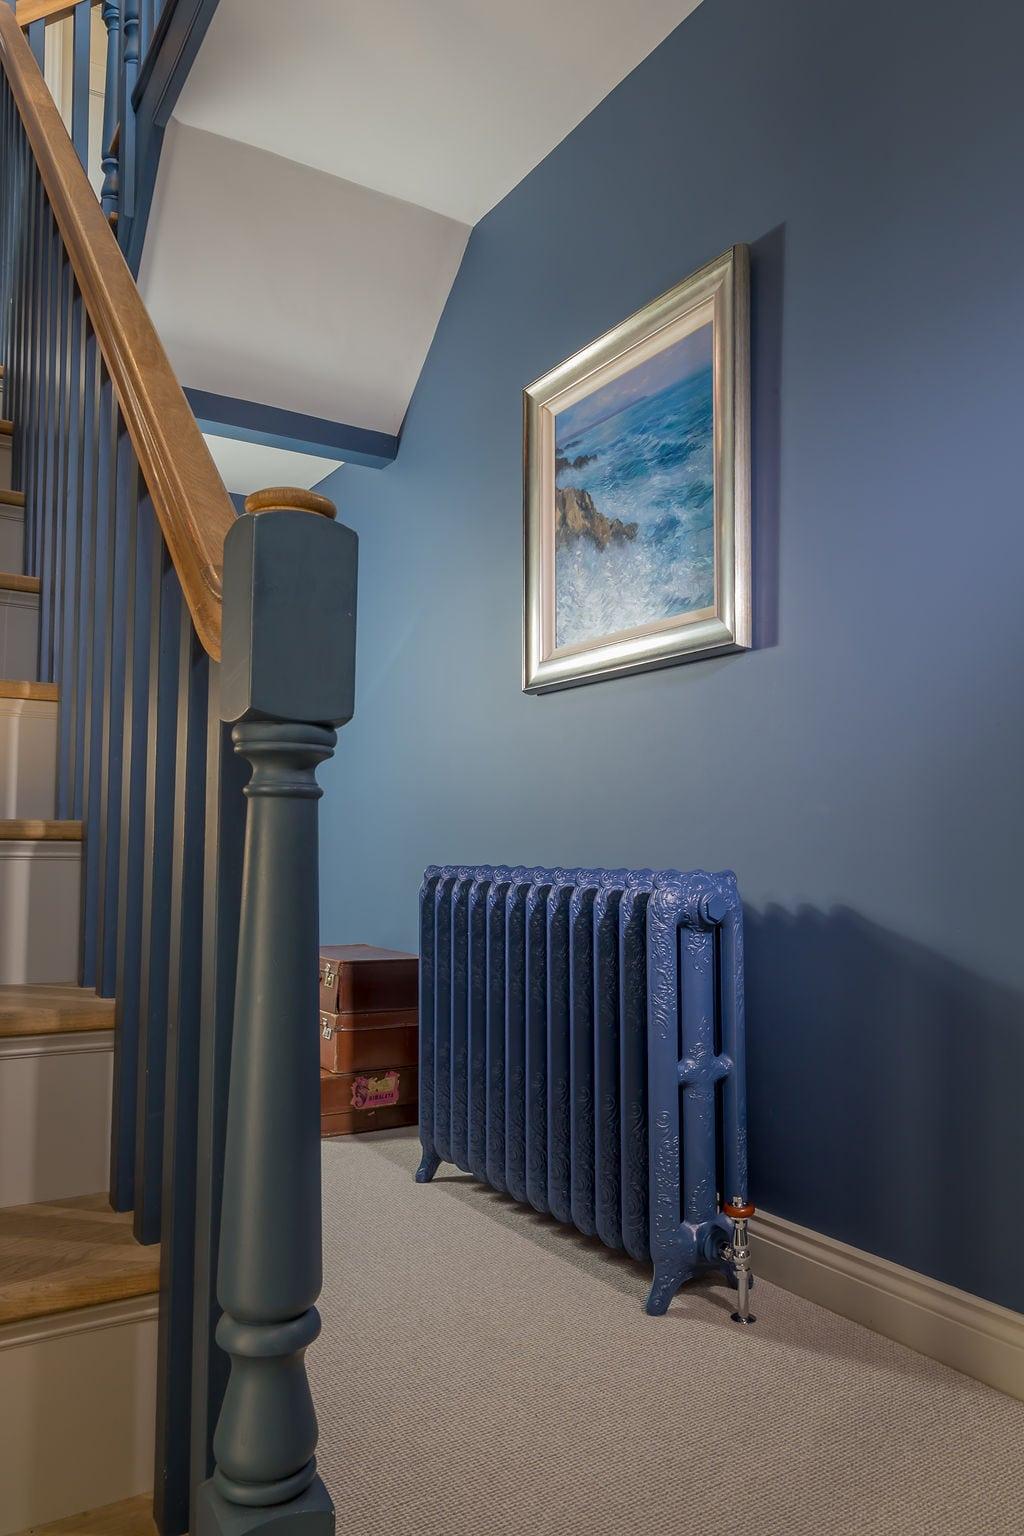 Oxford Ornate Radiator in Hallway Setting